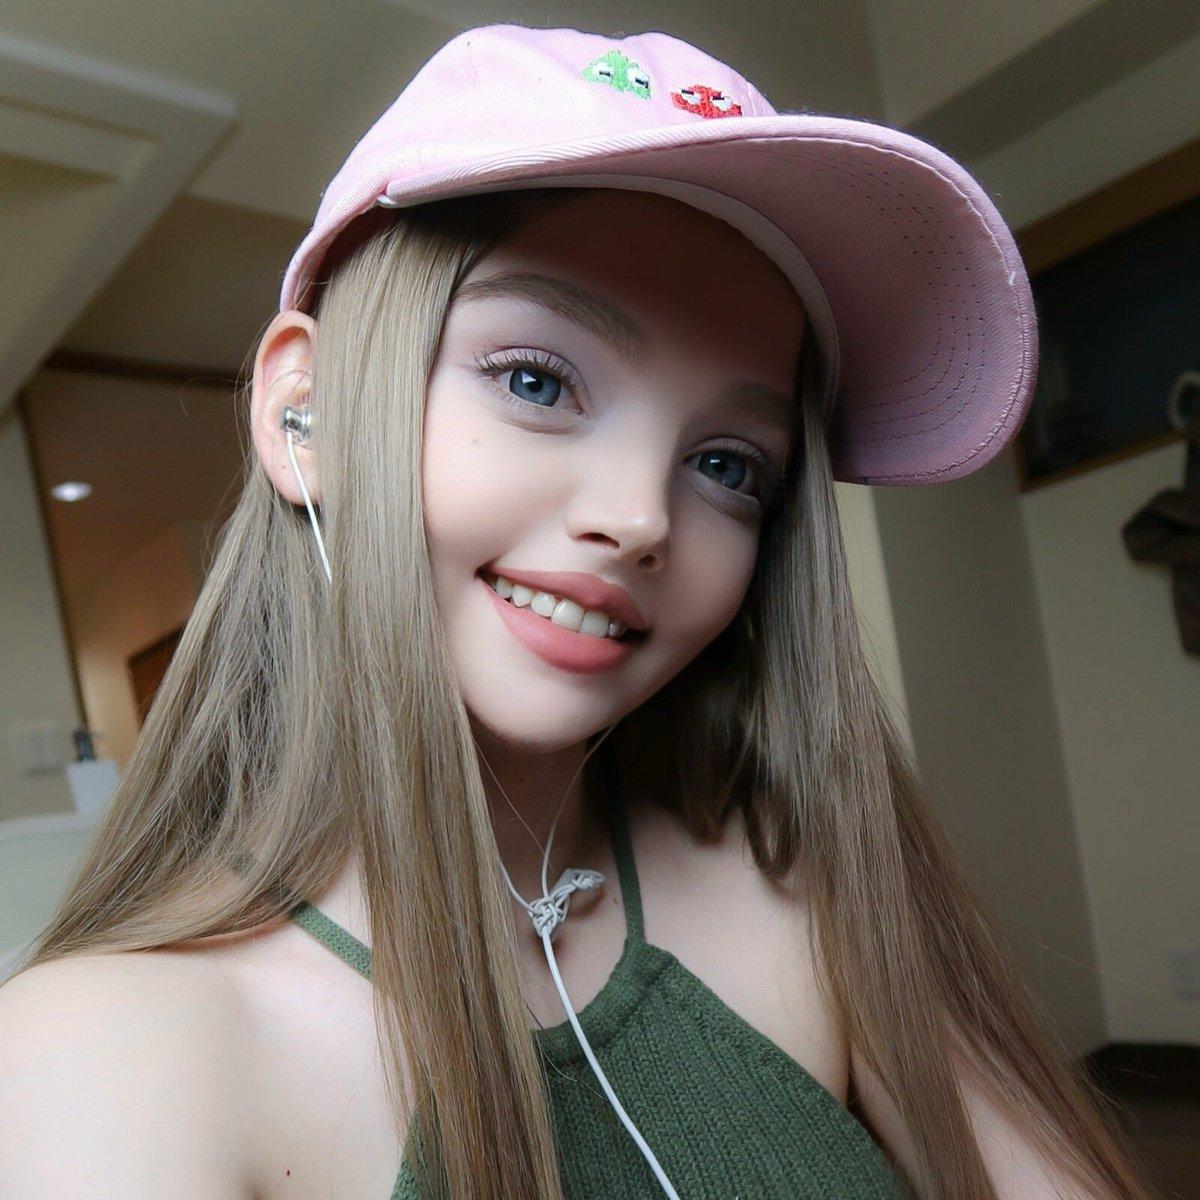 Doll teen model, australia homemade sex videos